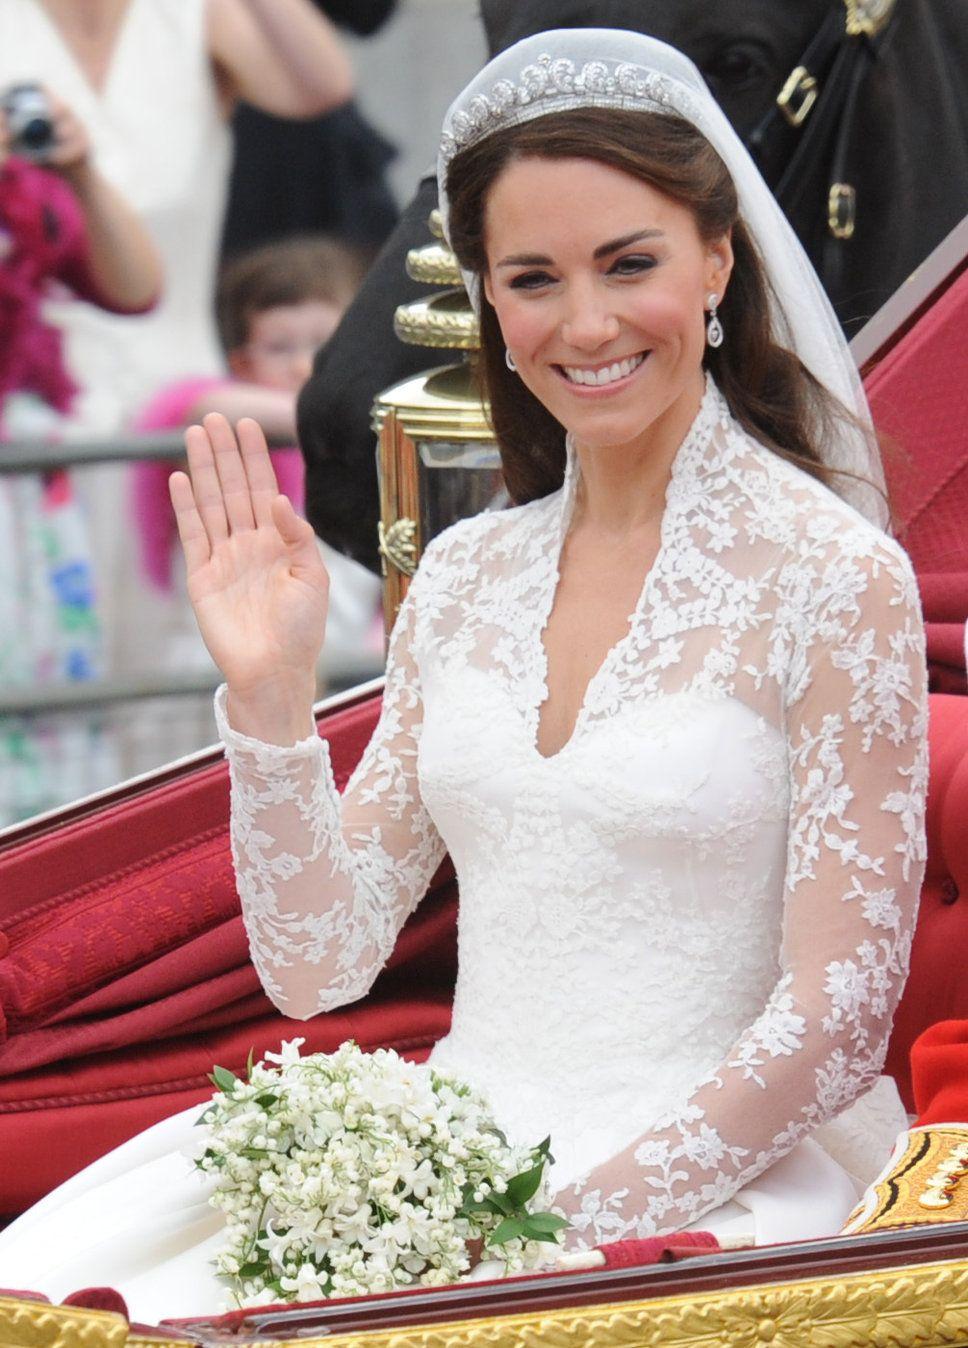 Princess | HRH Duke and Duchess | Pinterest | Princess, Kate ...